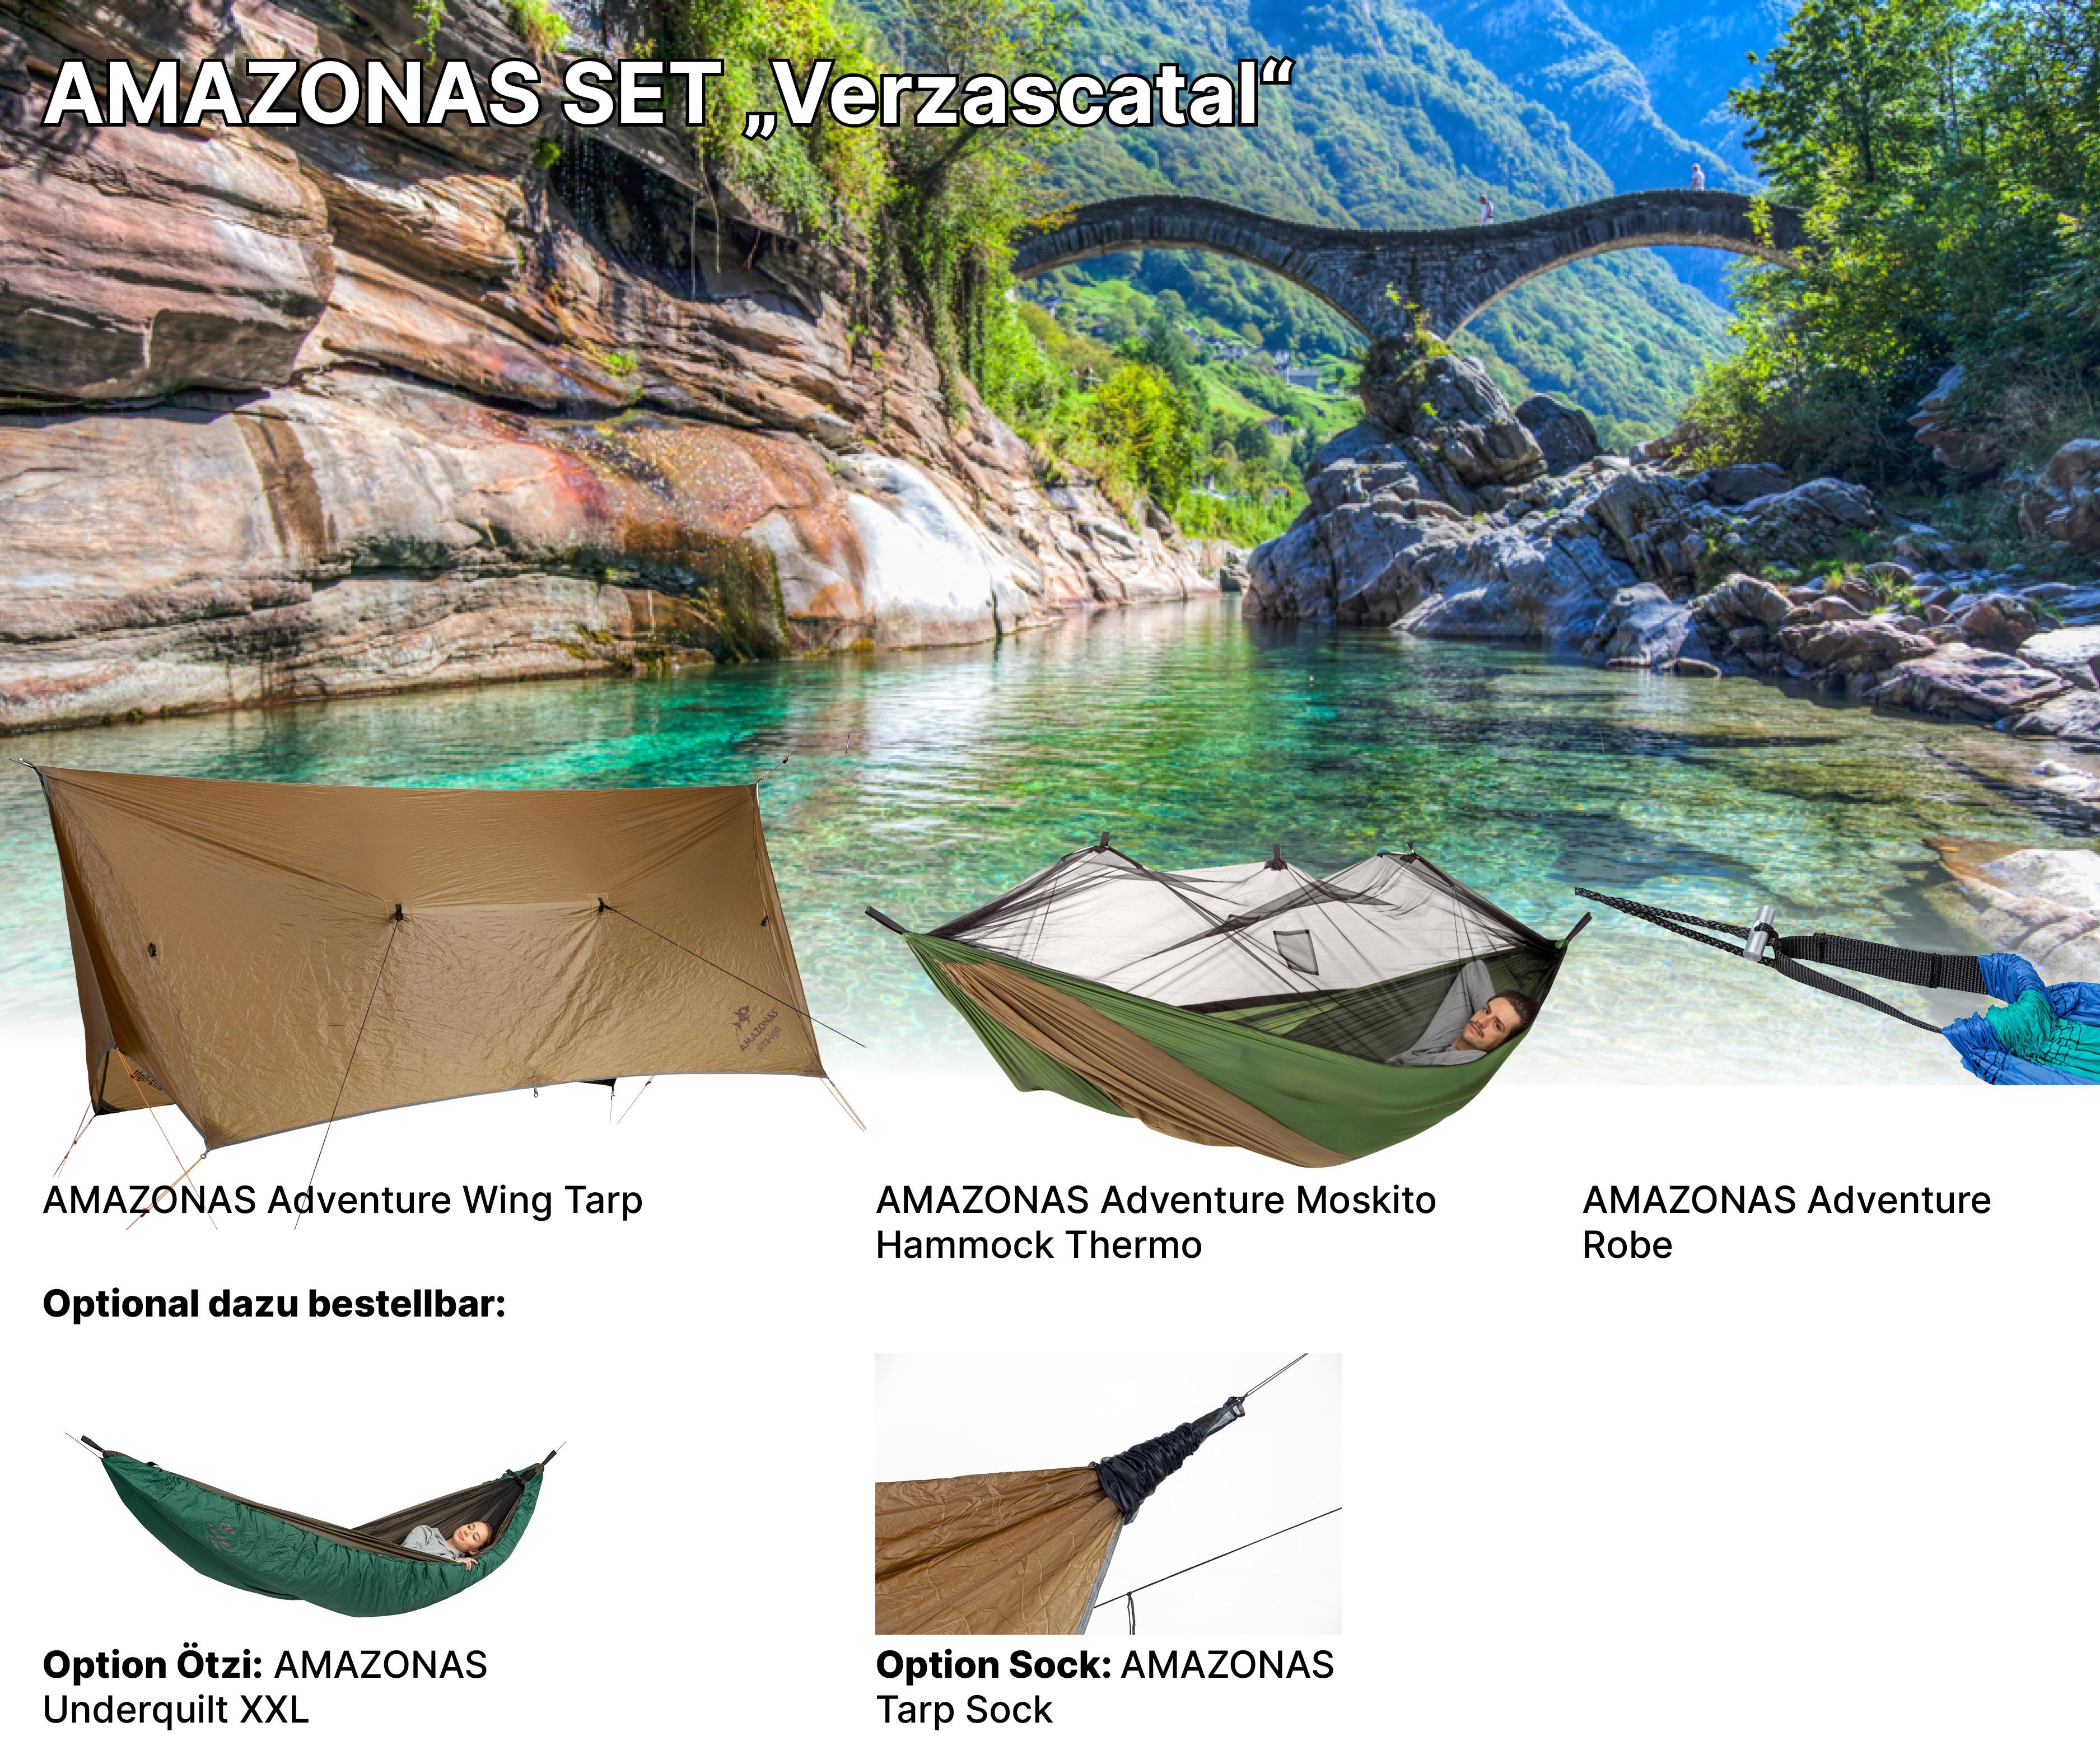 AMAZONAS Adventure Set Verzascatal AMAZONAS Poncho zum Sonderpreis AMAZONAS Sock zum Sonderpreis